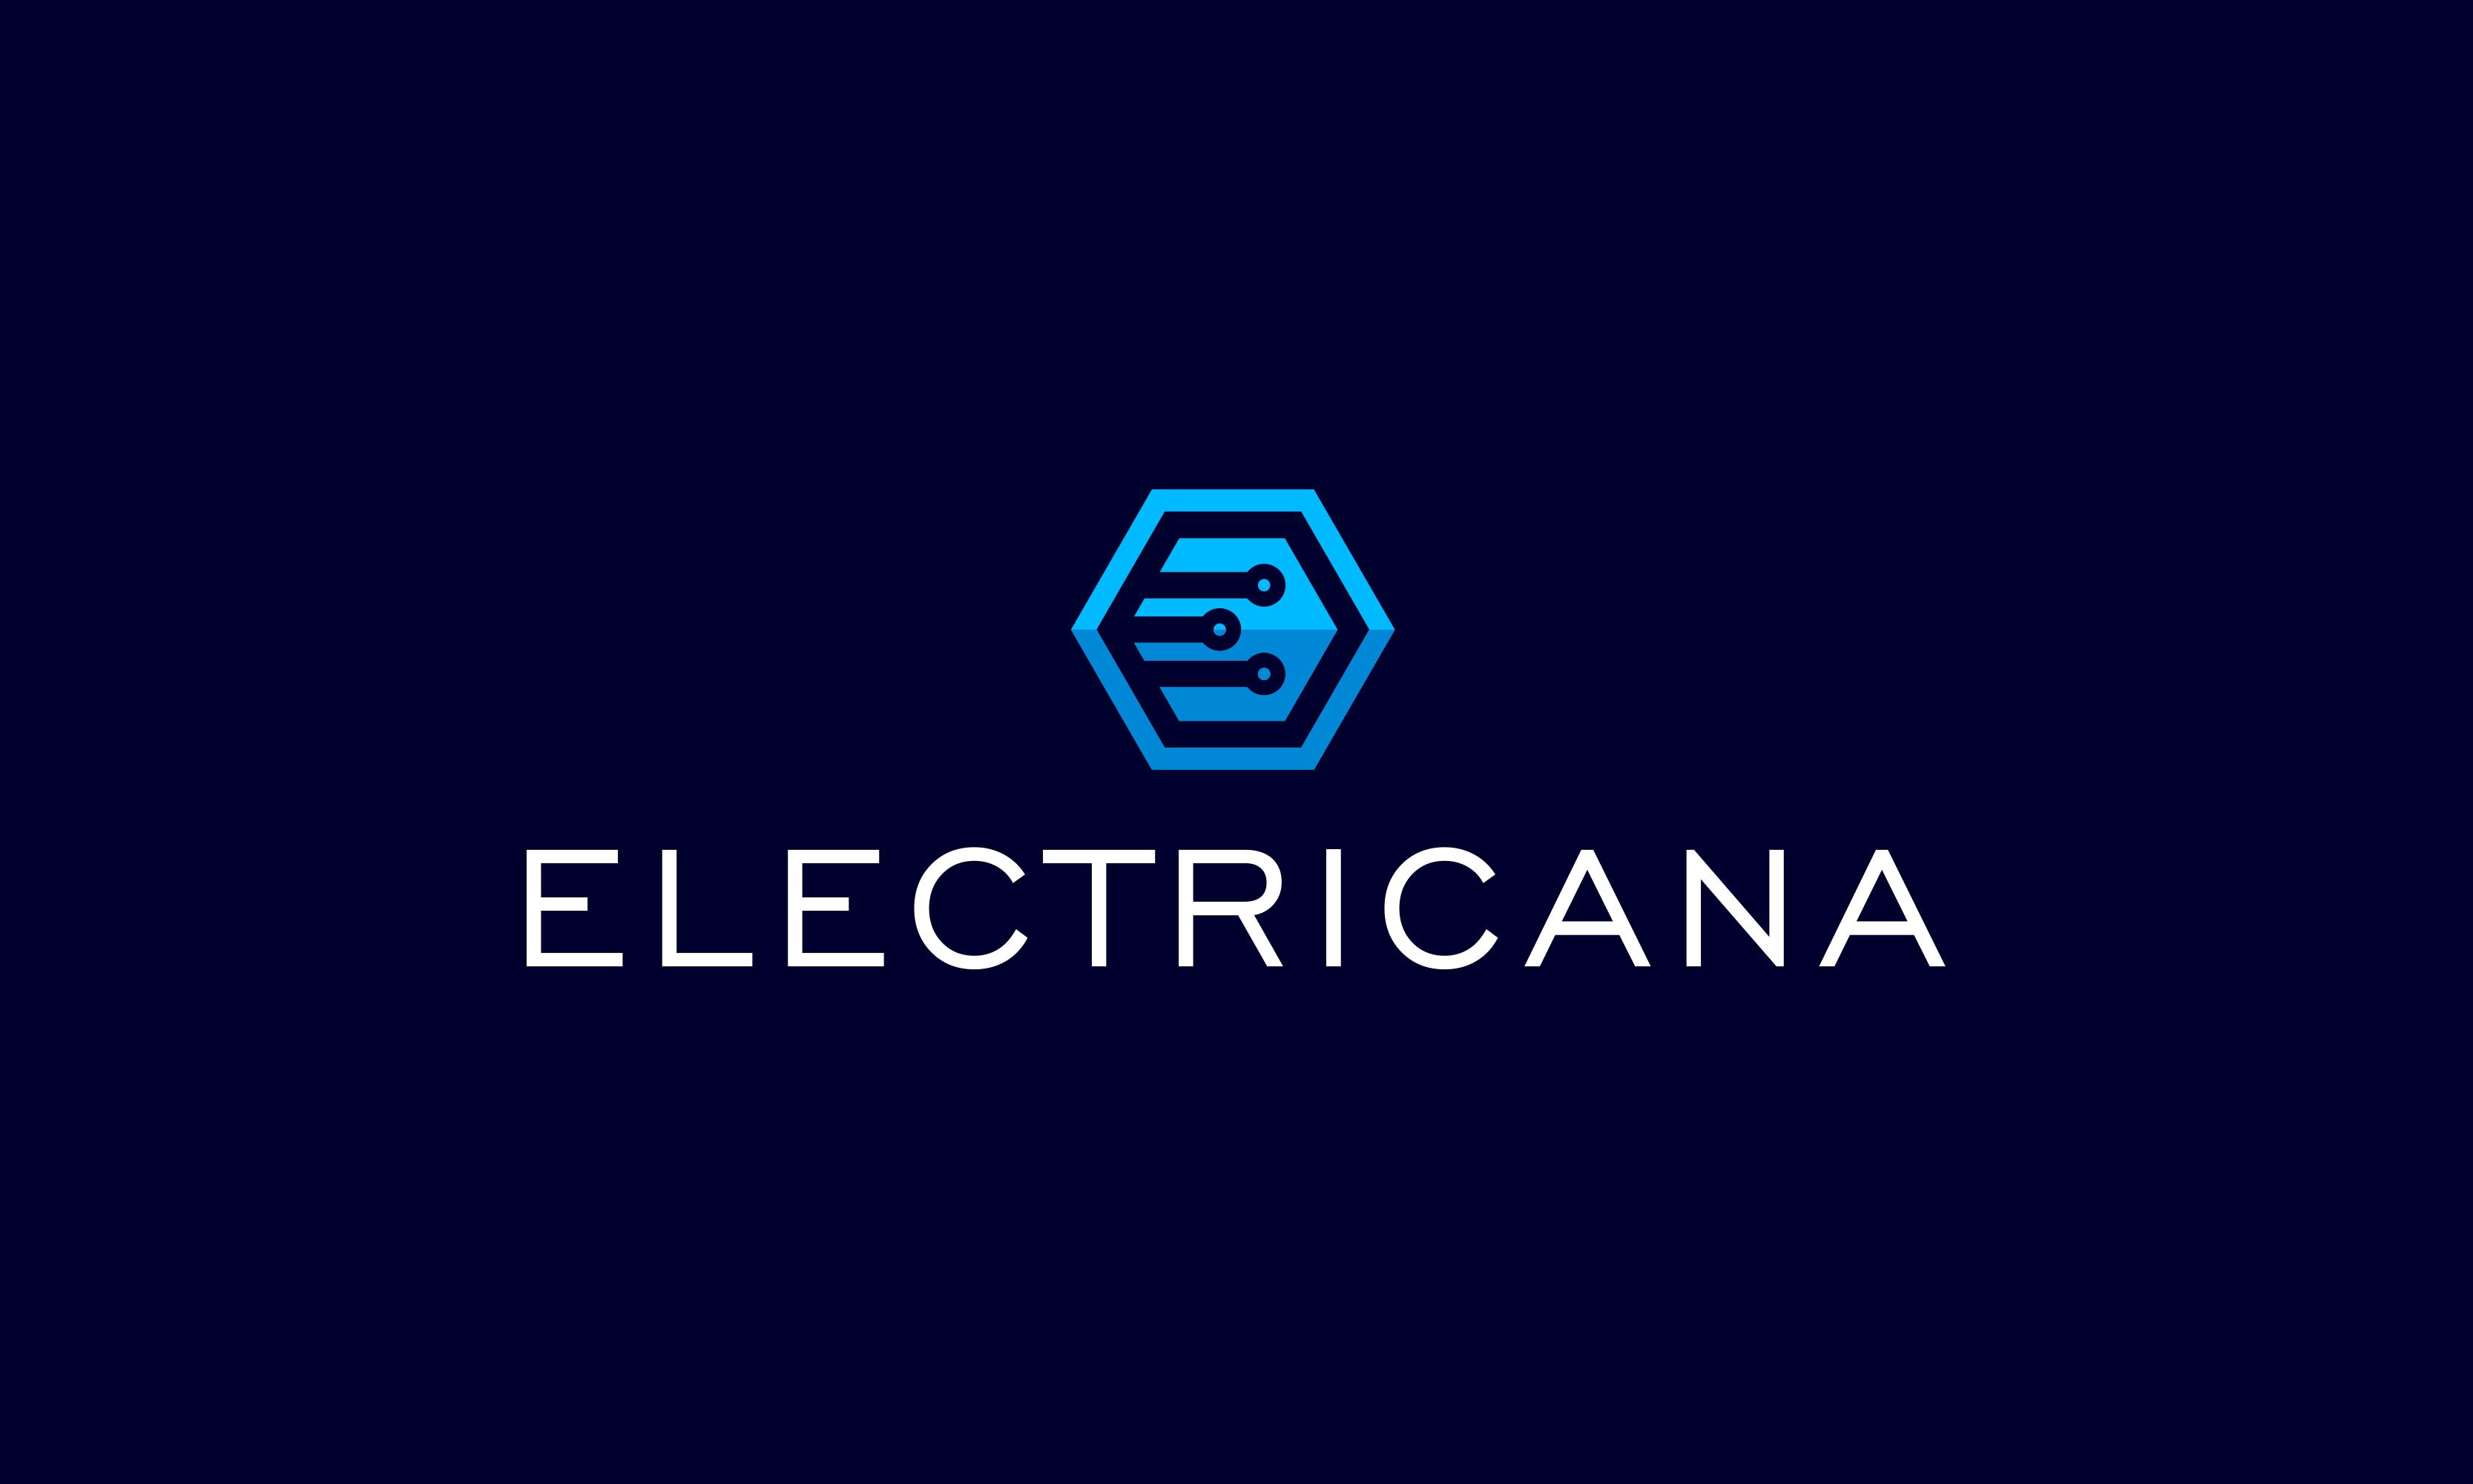 Electricana